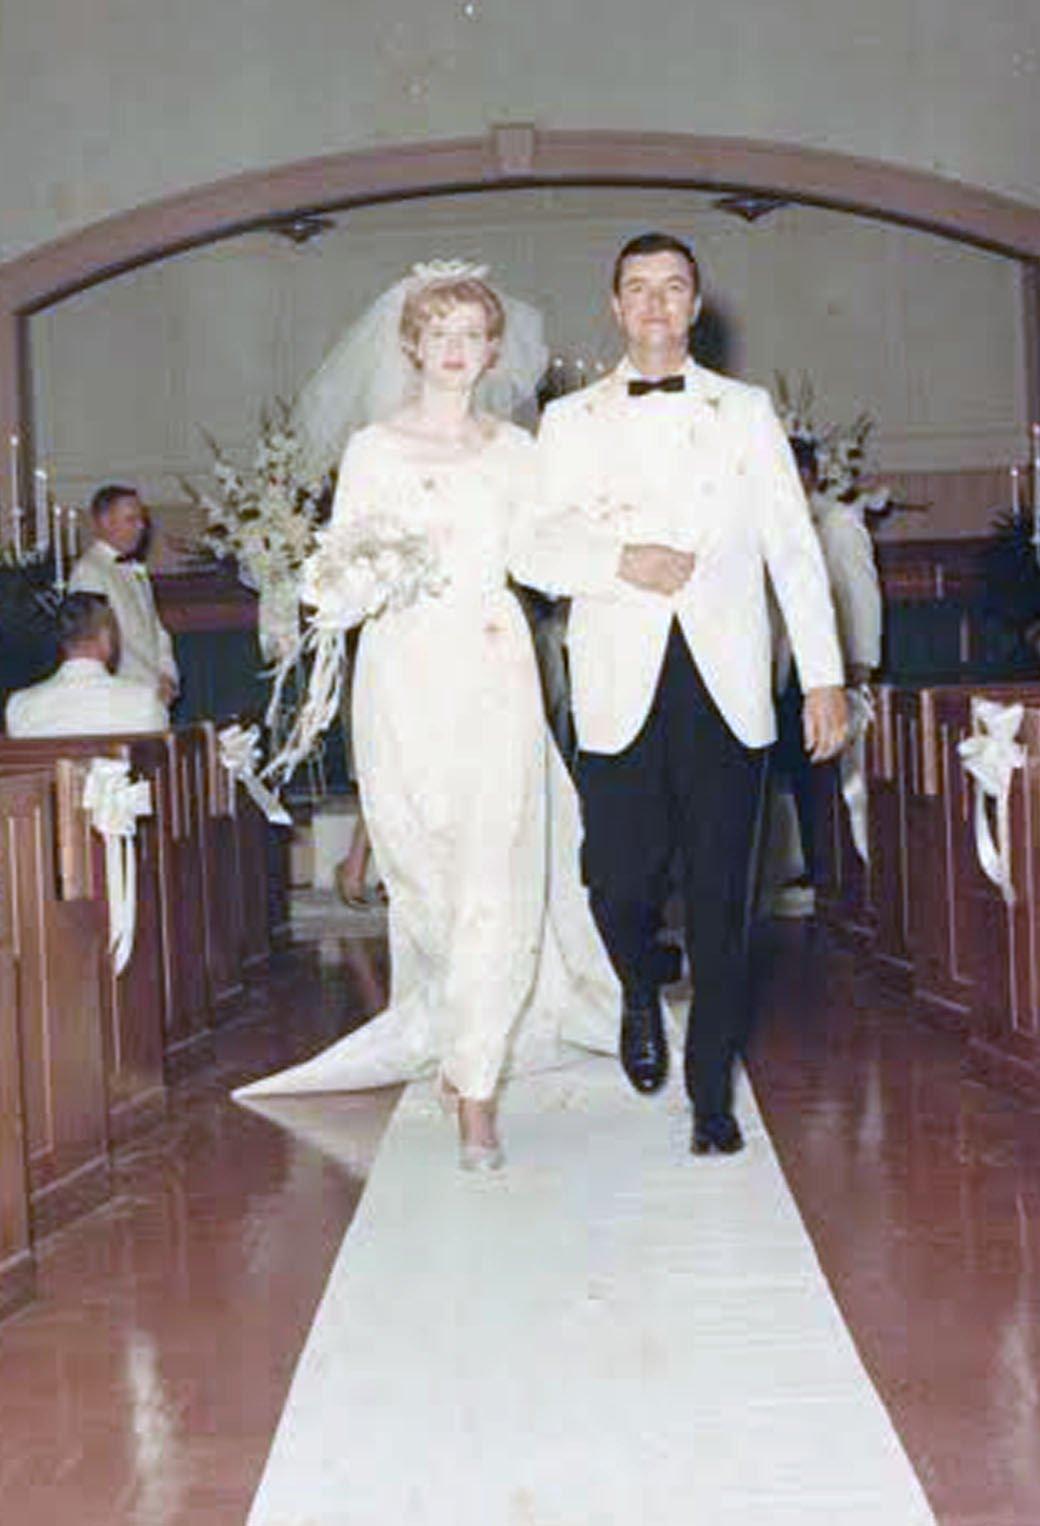 Kenneth and Carolyn Terry